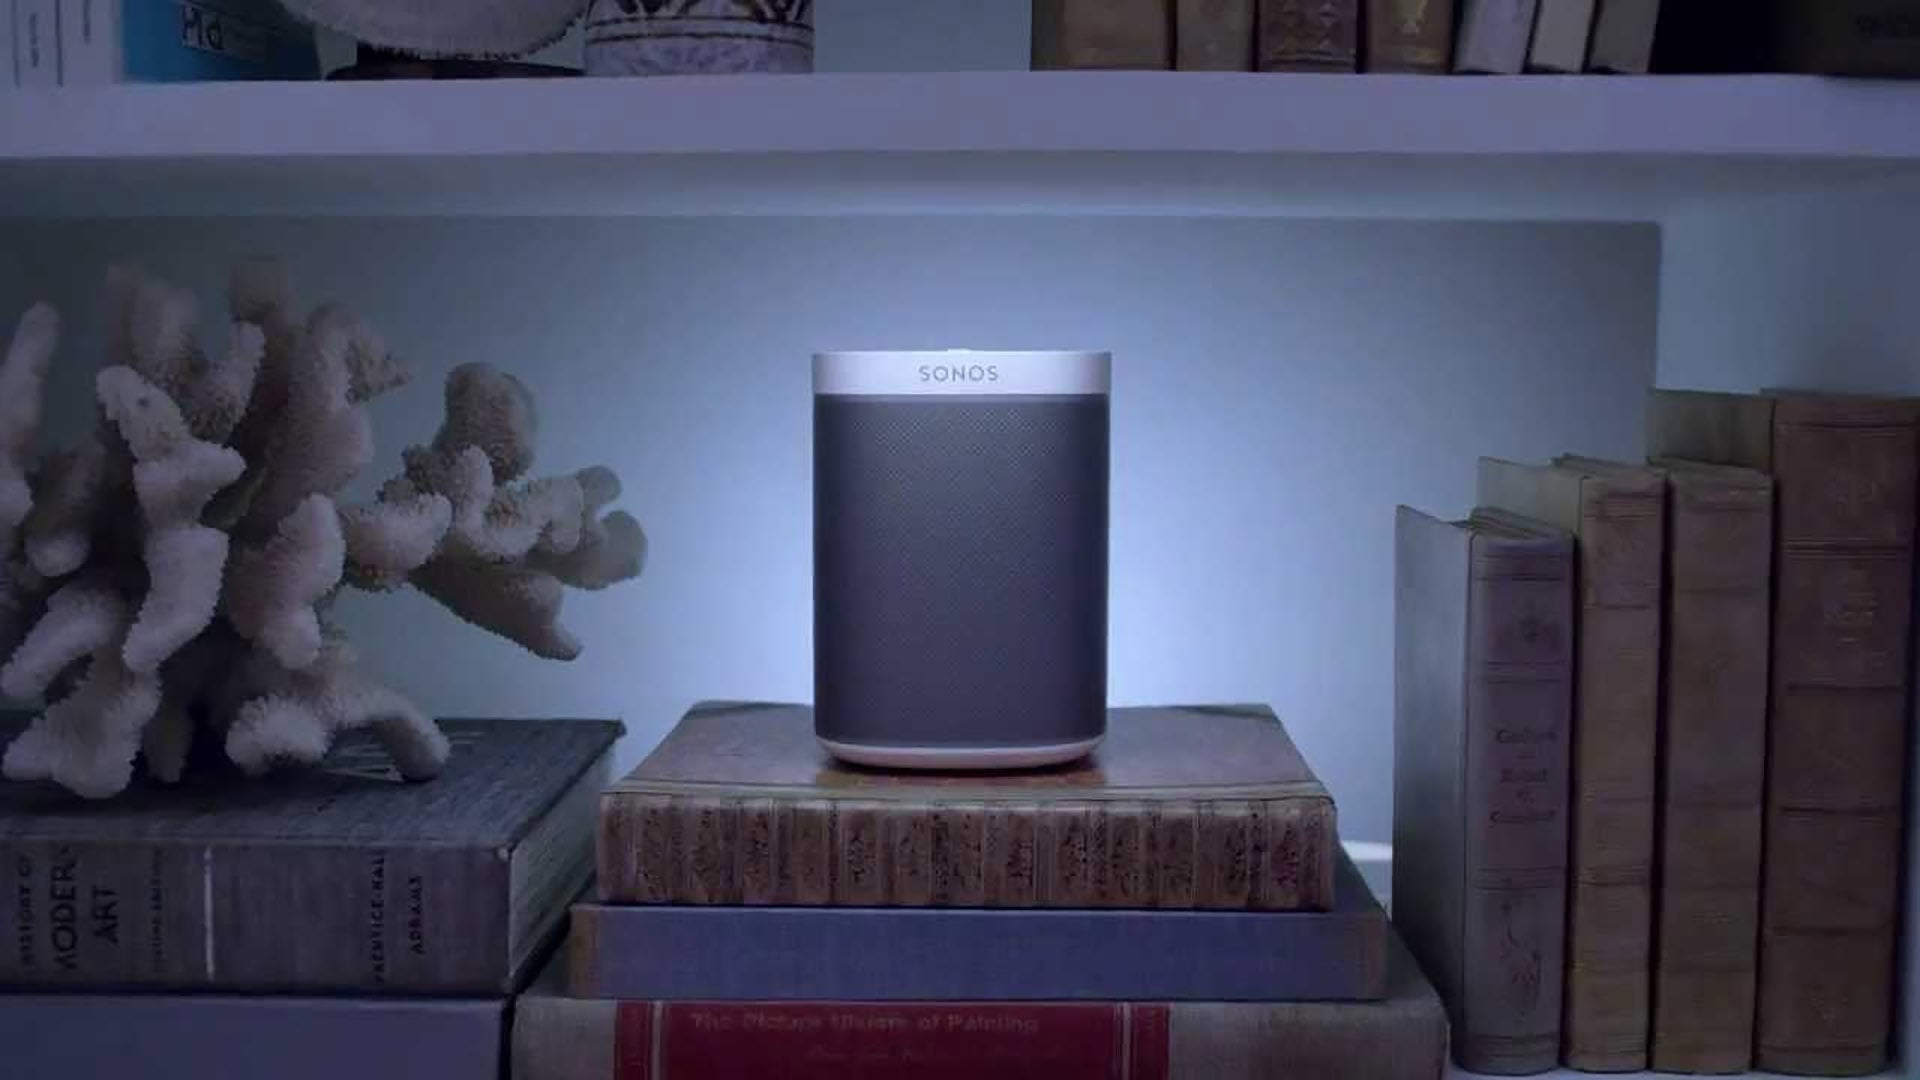 google home use sonos as default speaker